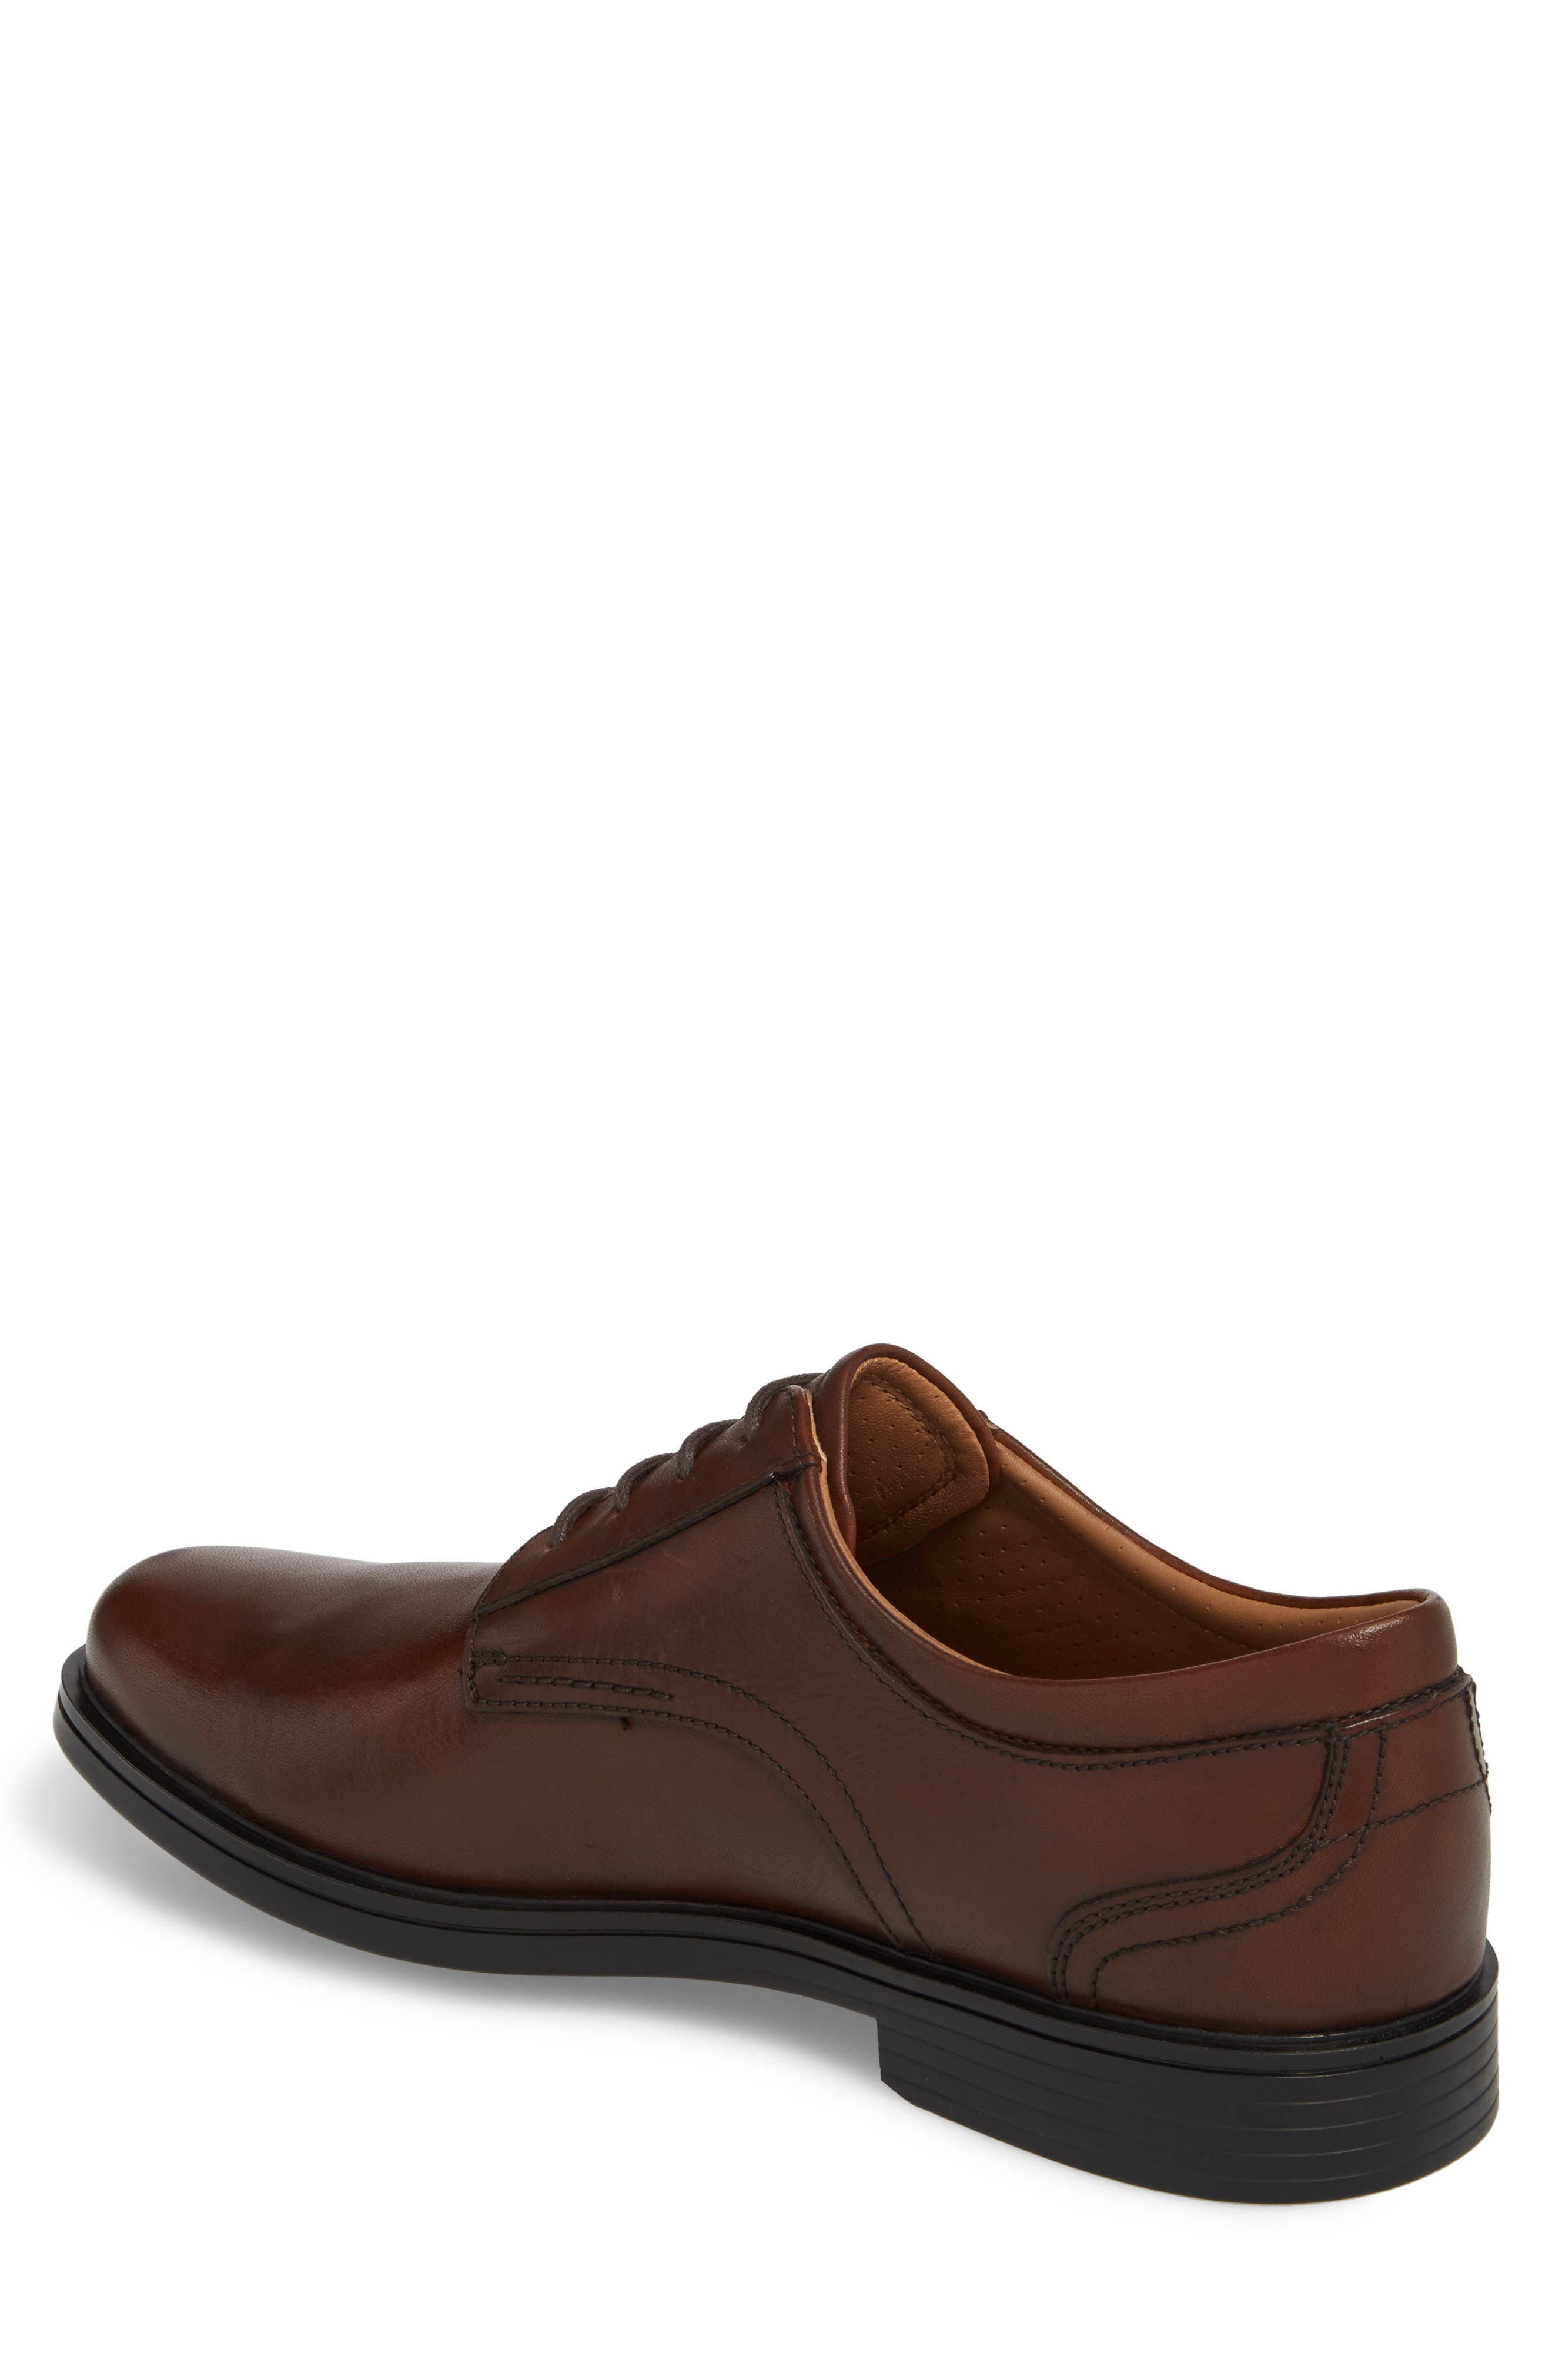 Unaldric Plain Toe Derby,                             Alternate thumbnail 2, color,                             Dark Tan Leather